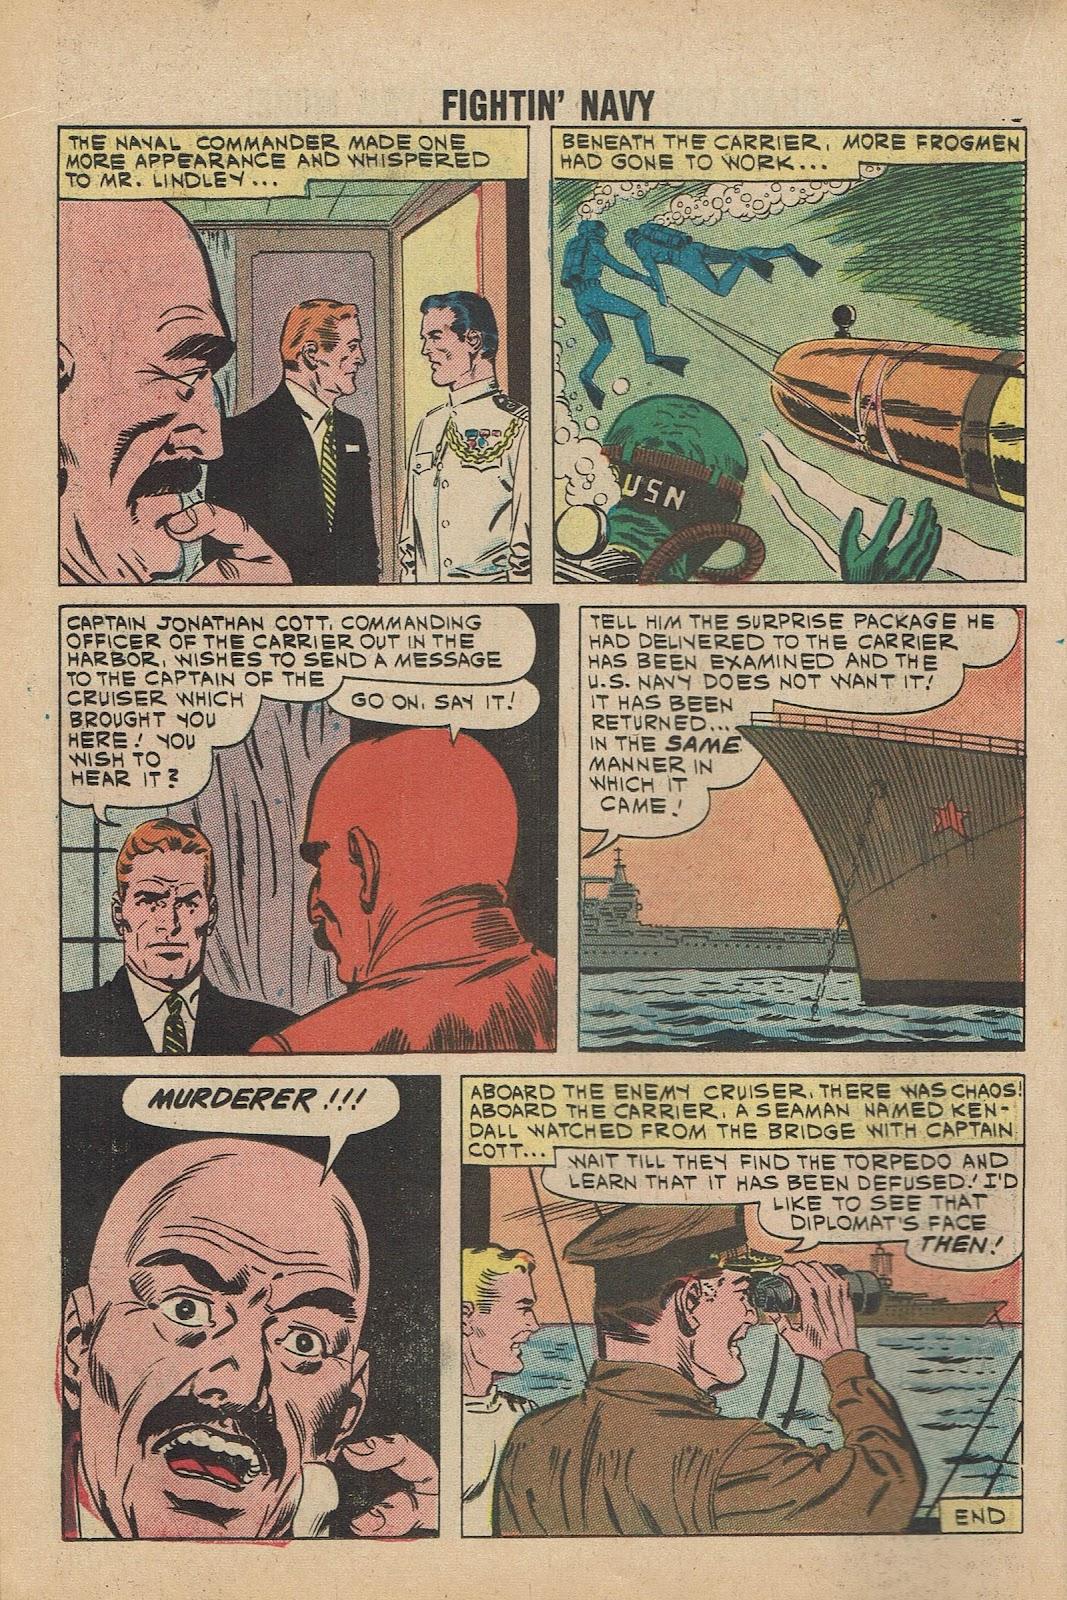 Read online Fightin' Navy comic -  Issue #98 - 18